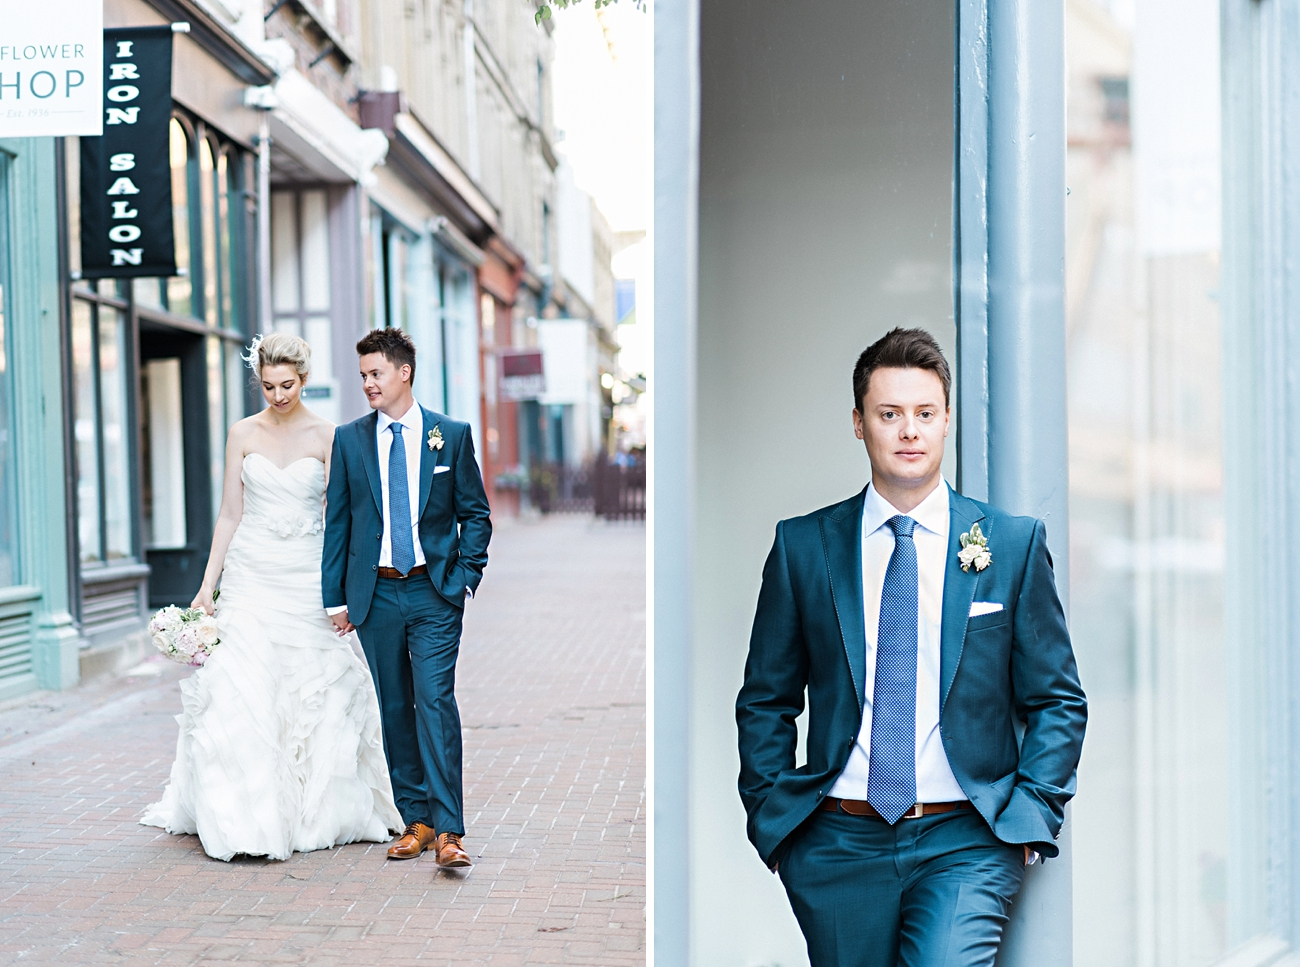 Sara-Seans-Halifax-Prince-George-Hotel-Wedding049.jpg